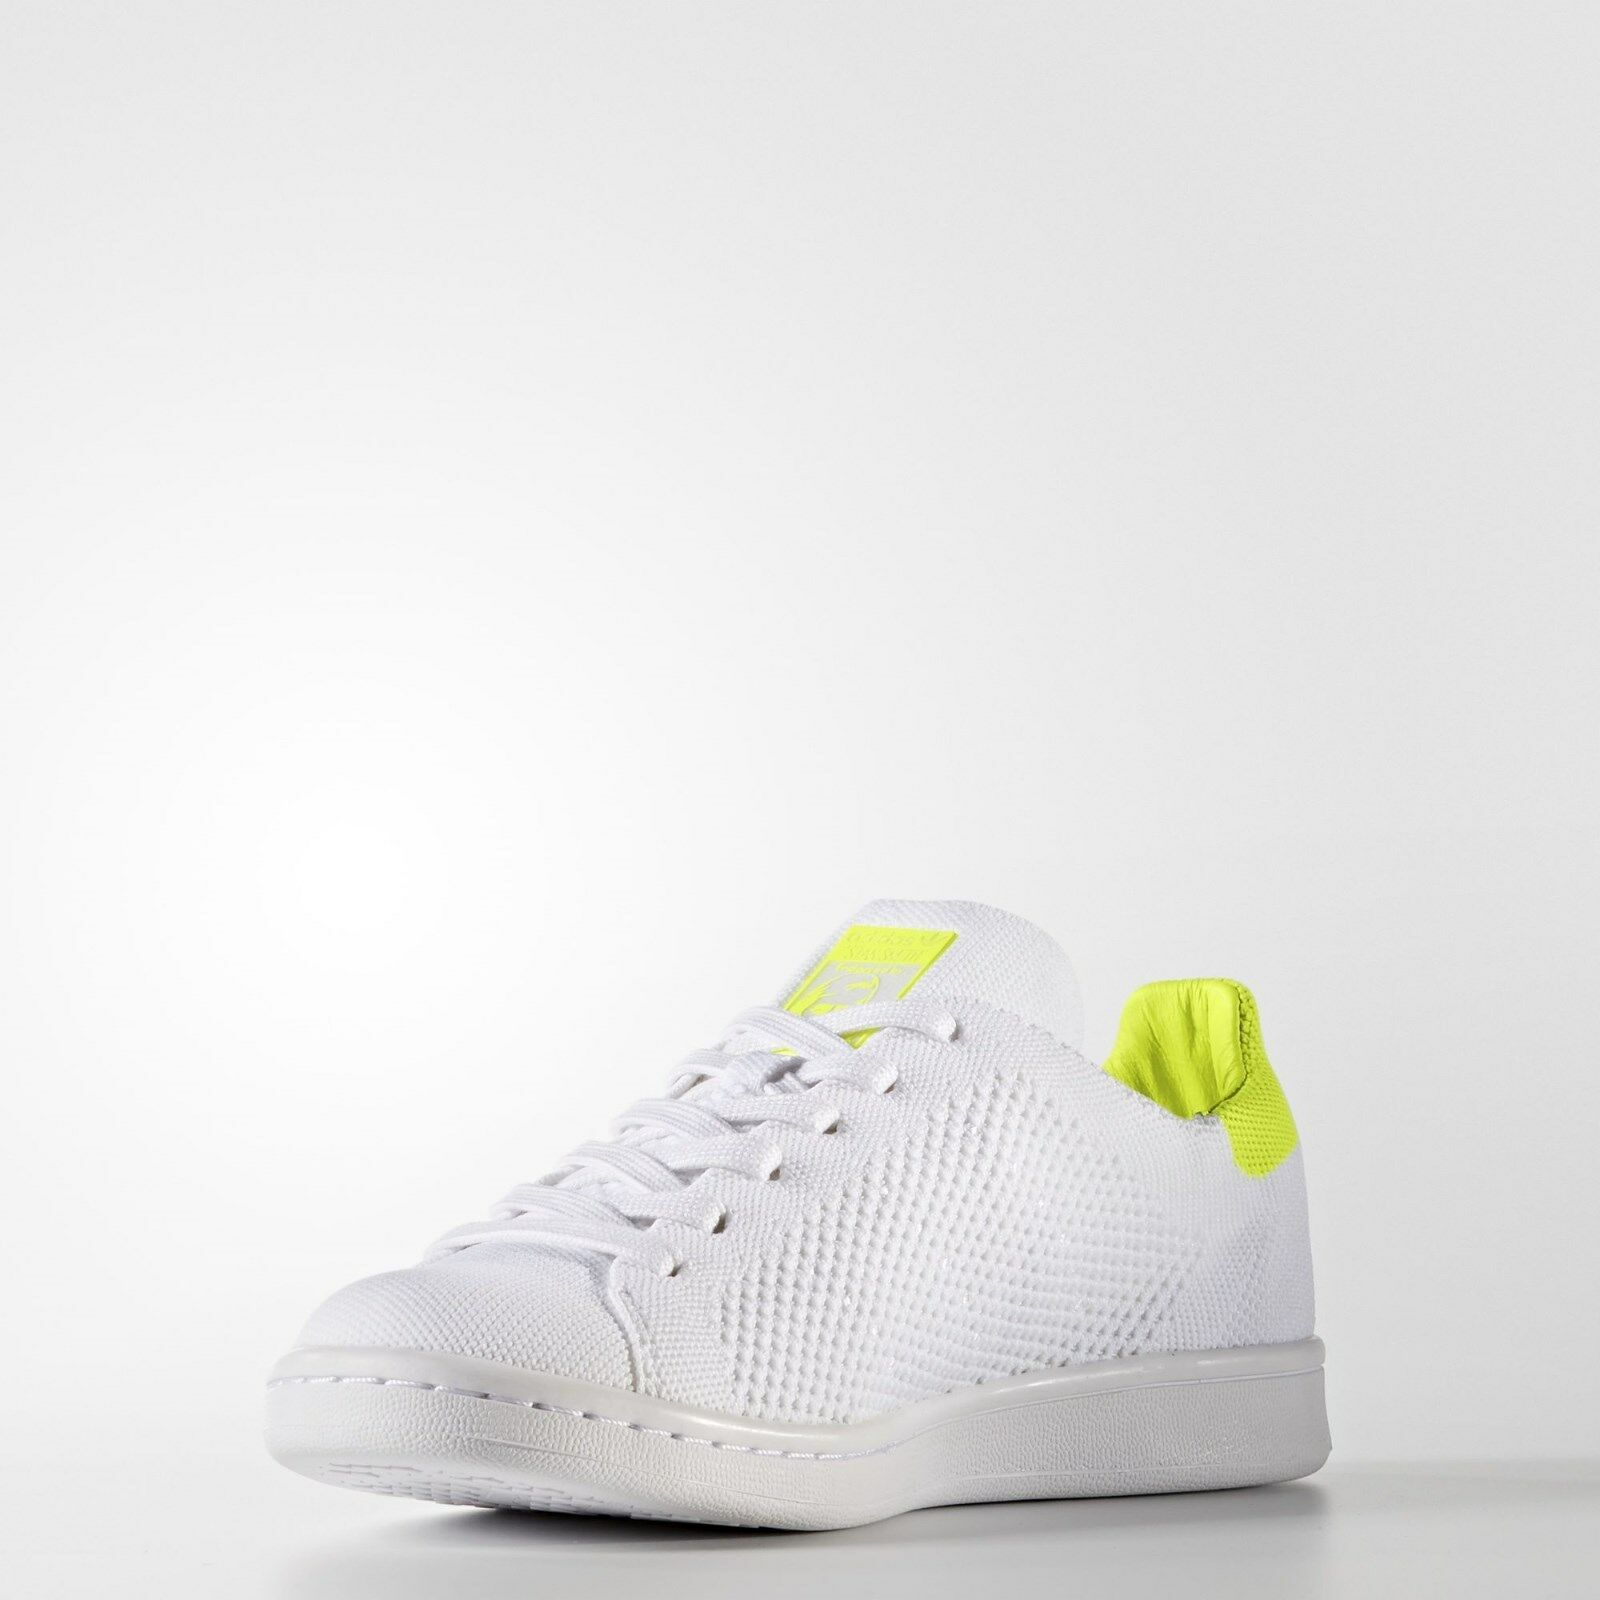 Adidas Originals Women's Stan Smith Primeknit shoes Size 5 us  BB5147